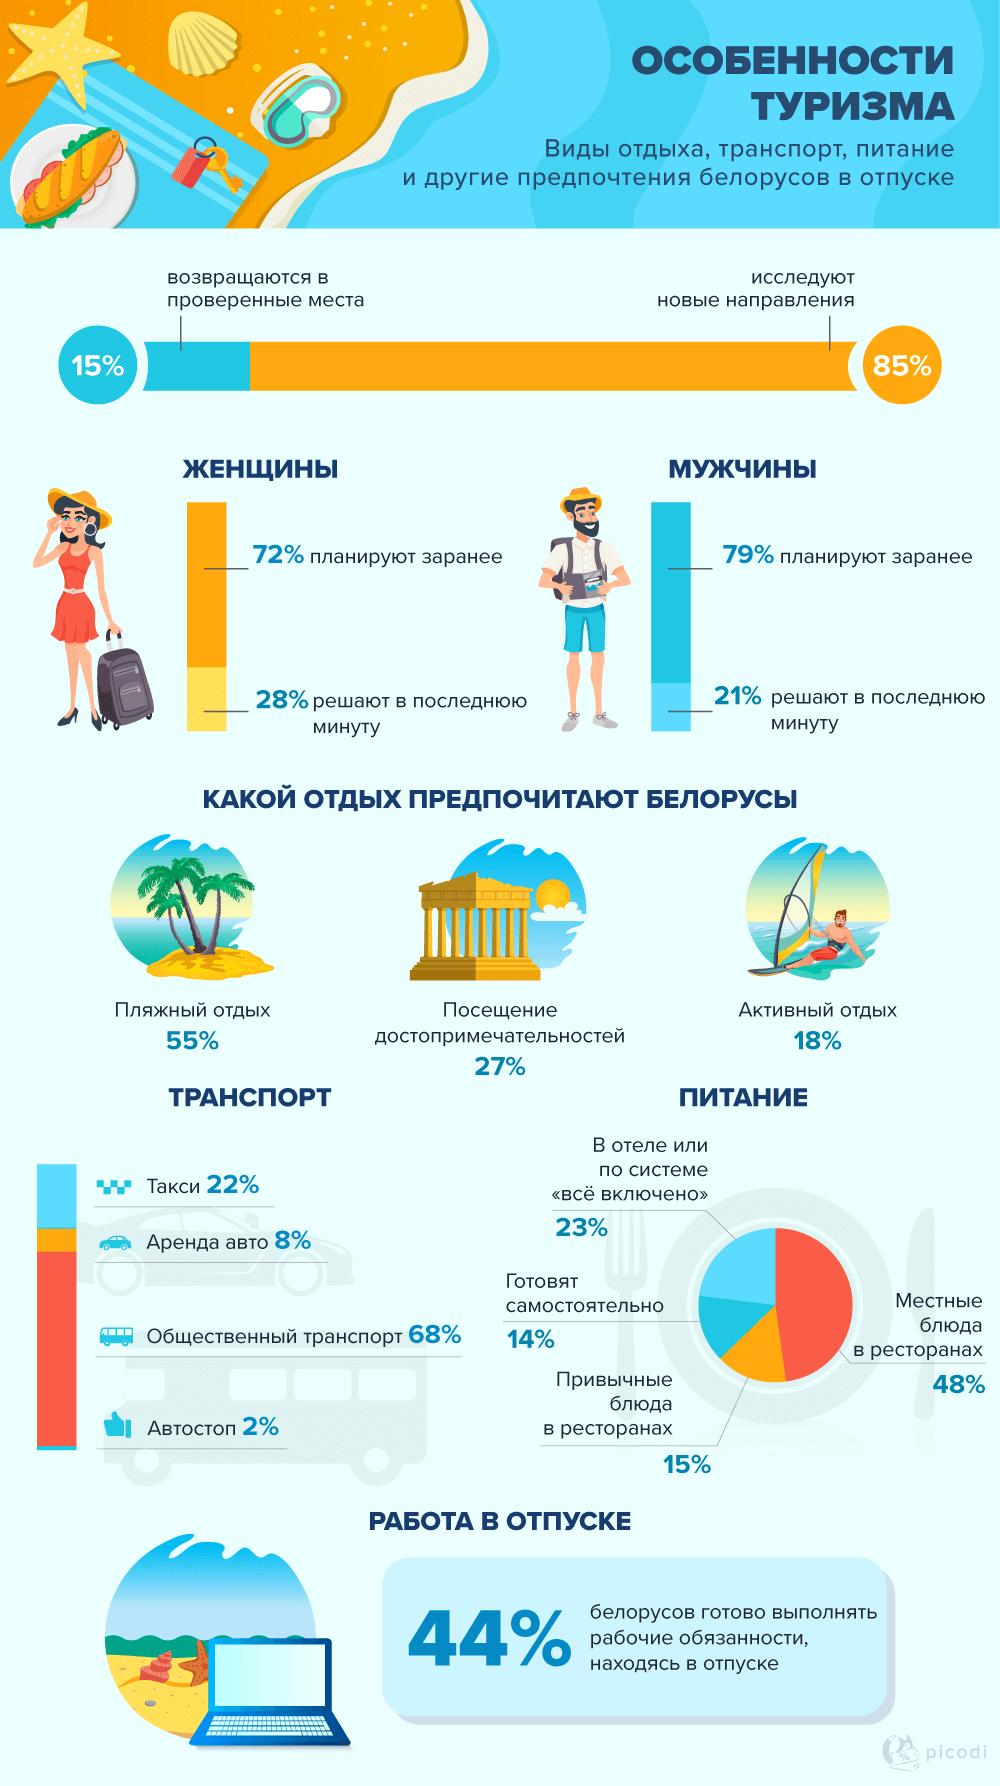 Особенности туризма в Беларуси. Статистика 2019